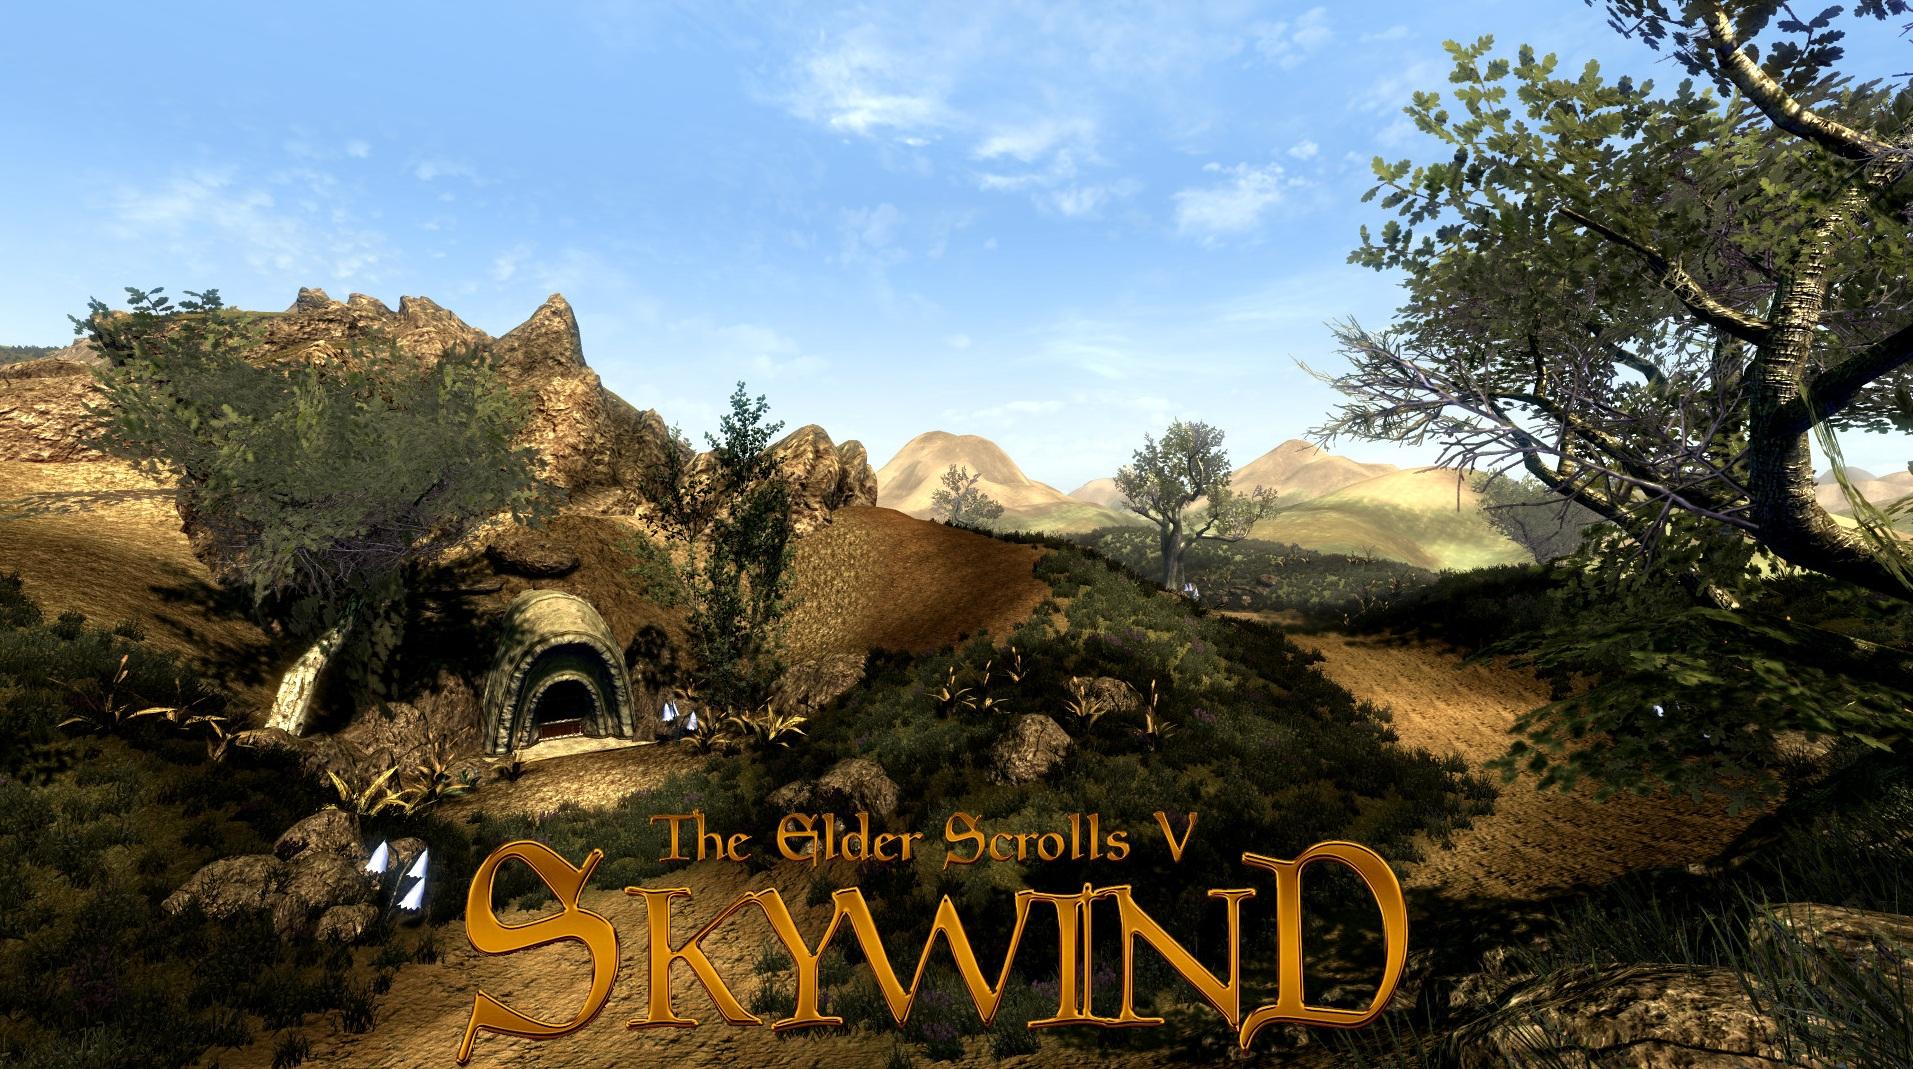 Skywind Games